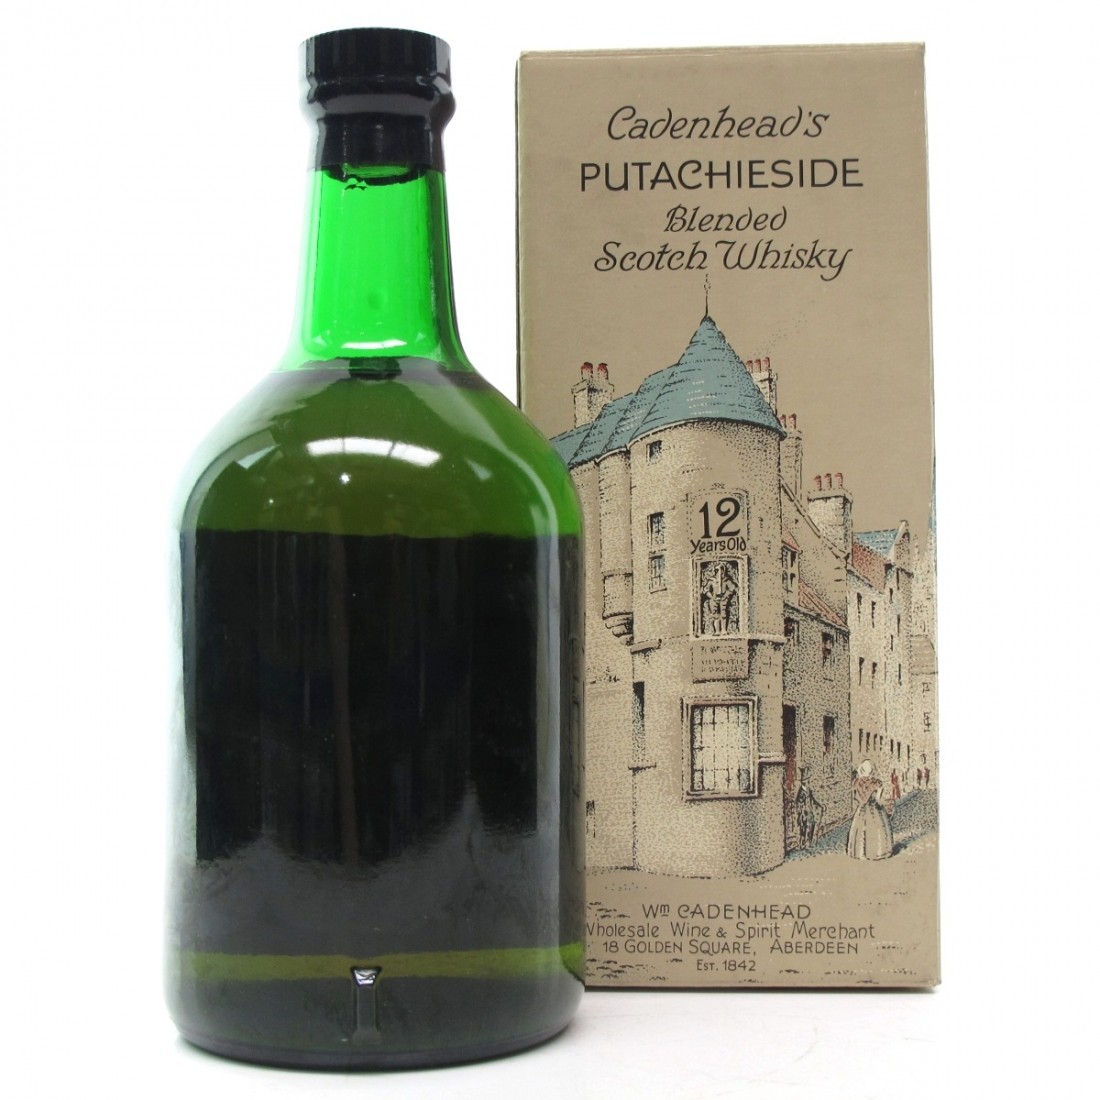 Cadenhead's Putachieside 12 Year Old